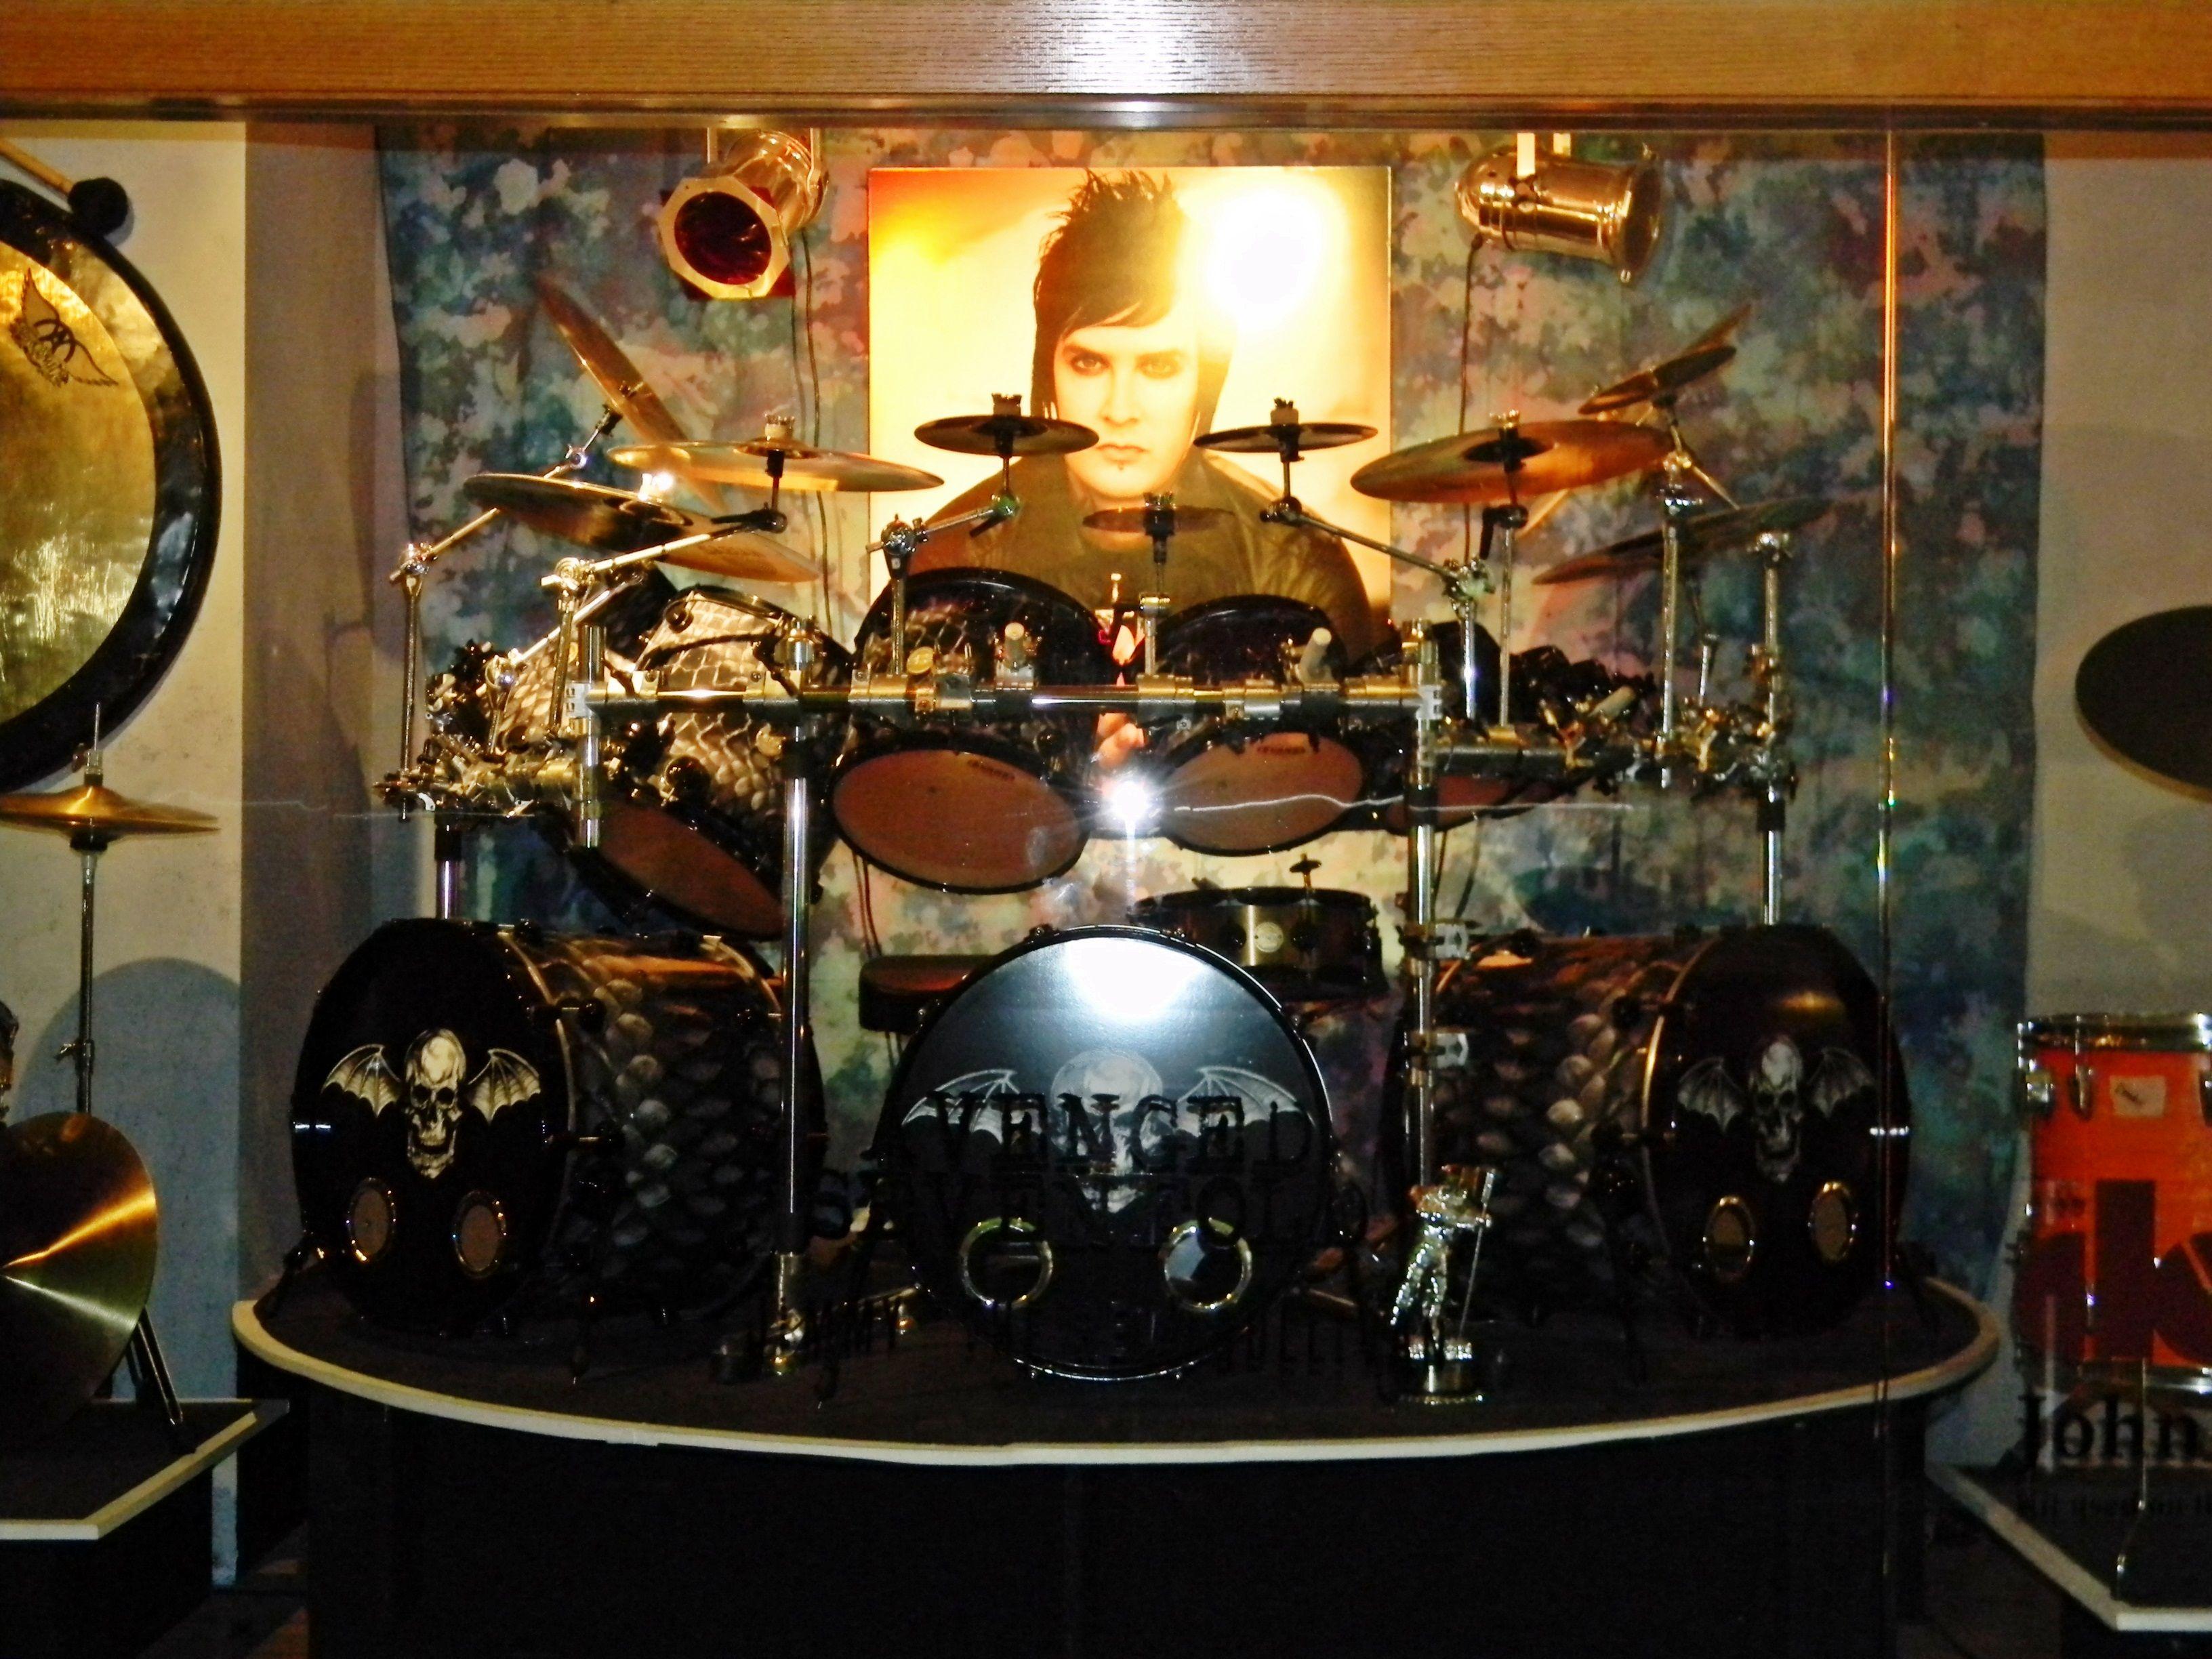 Avenged Sevenfolds Jimmy The Rev Sullivans Drum Kit On Display At Hard Rock Hotel And Casino Las Vegas NV